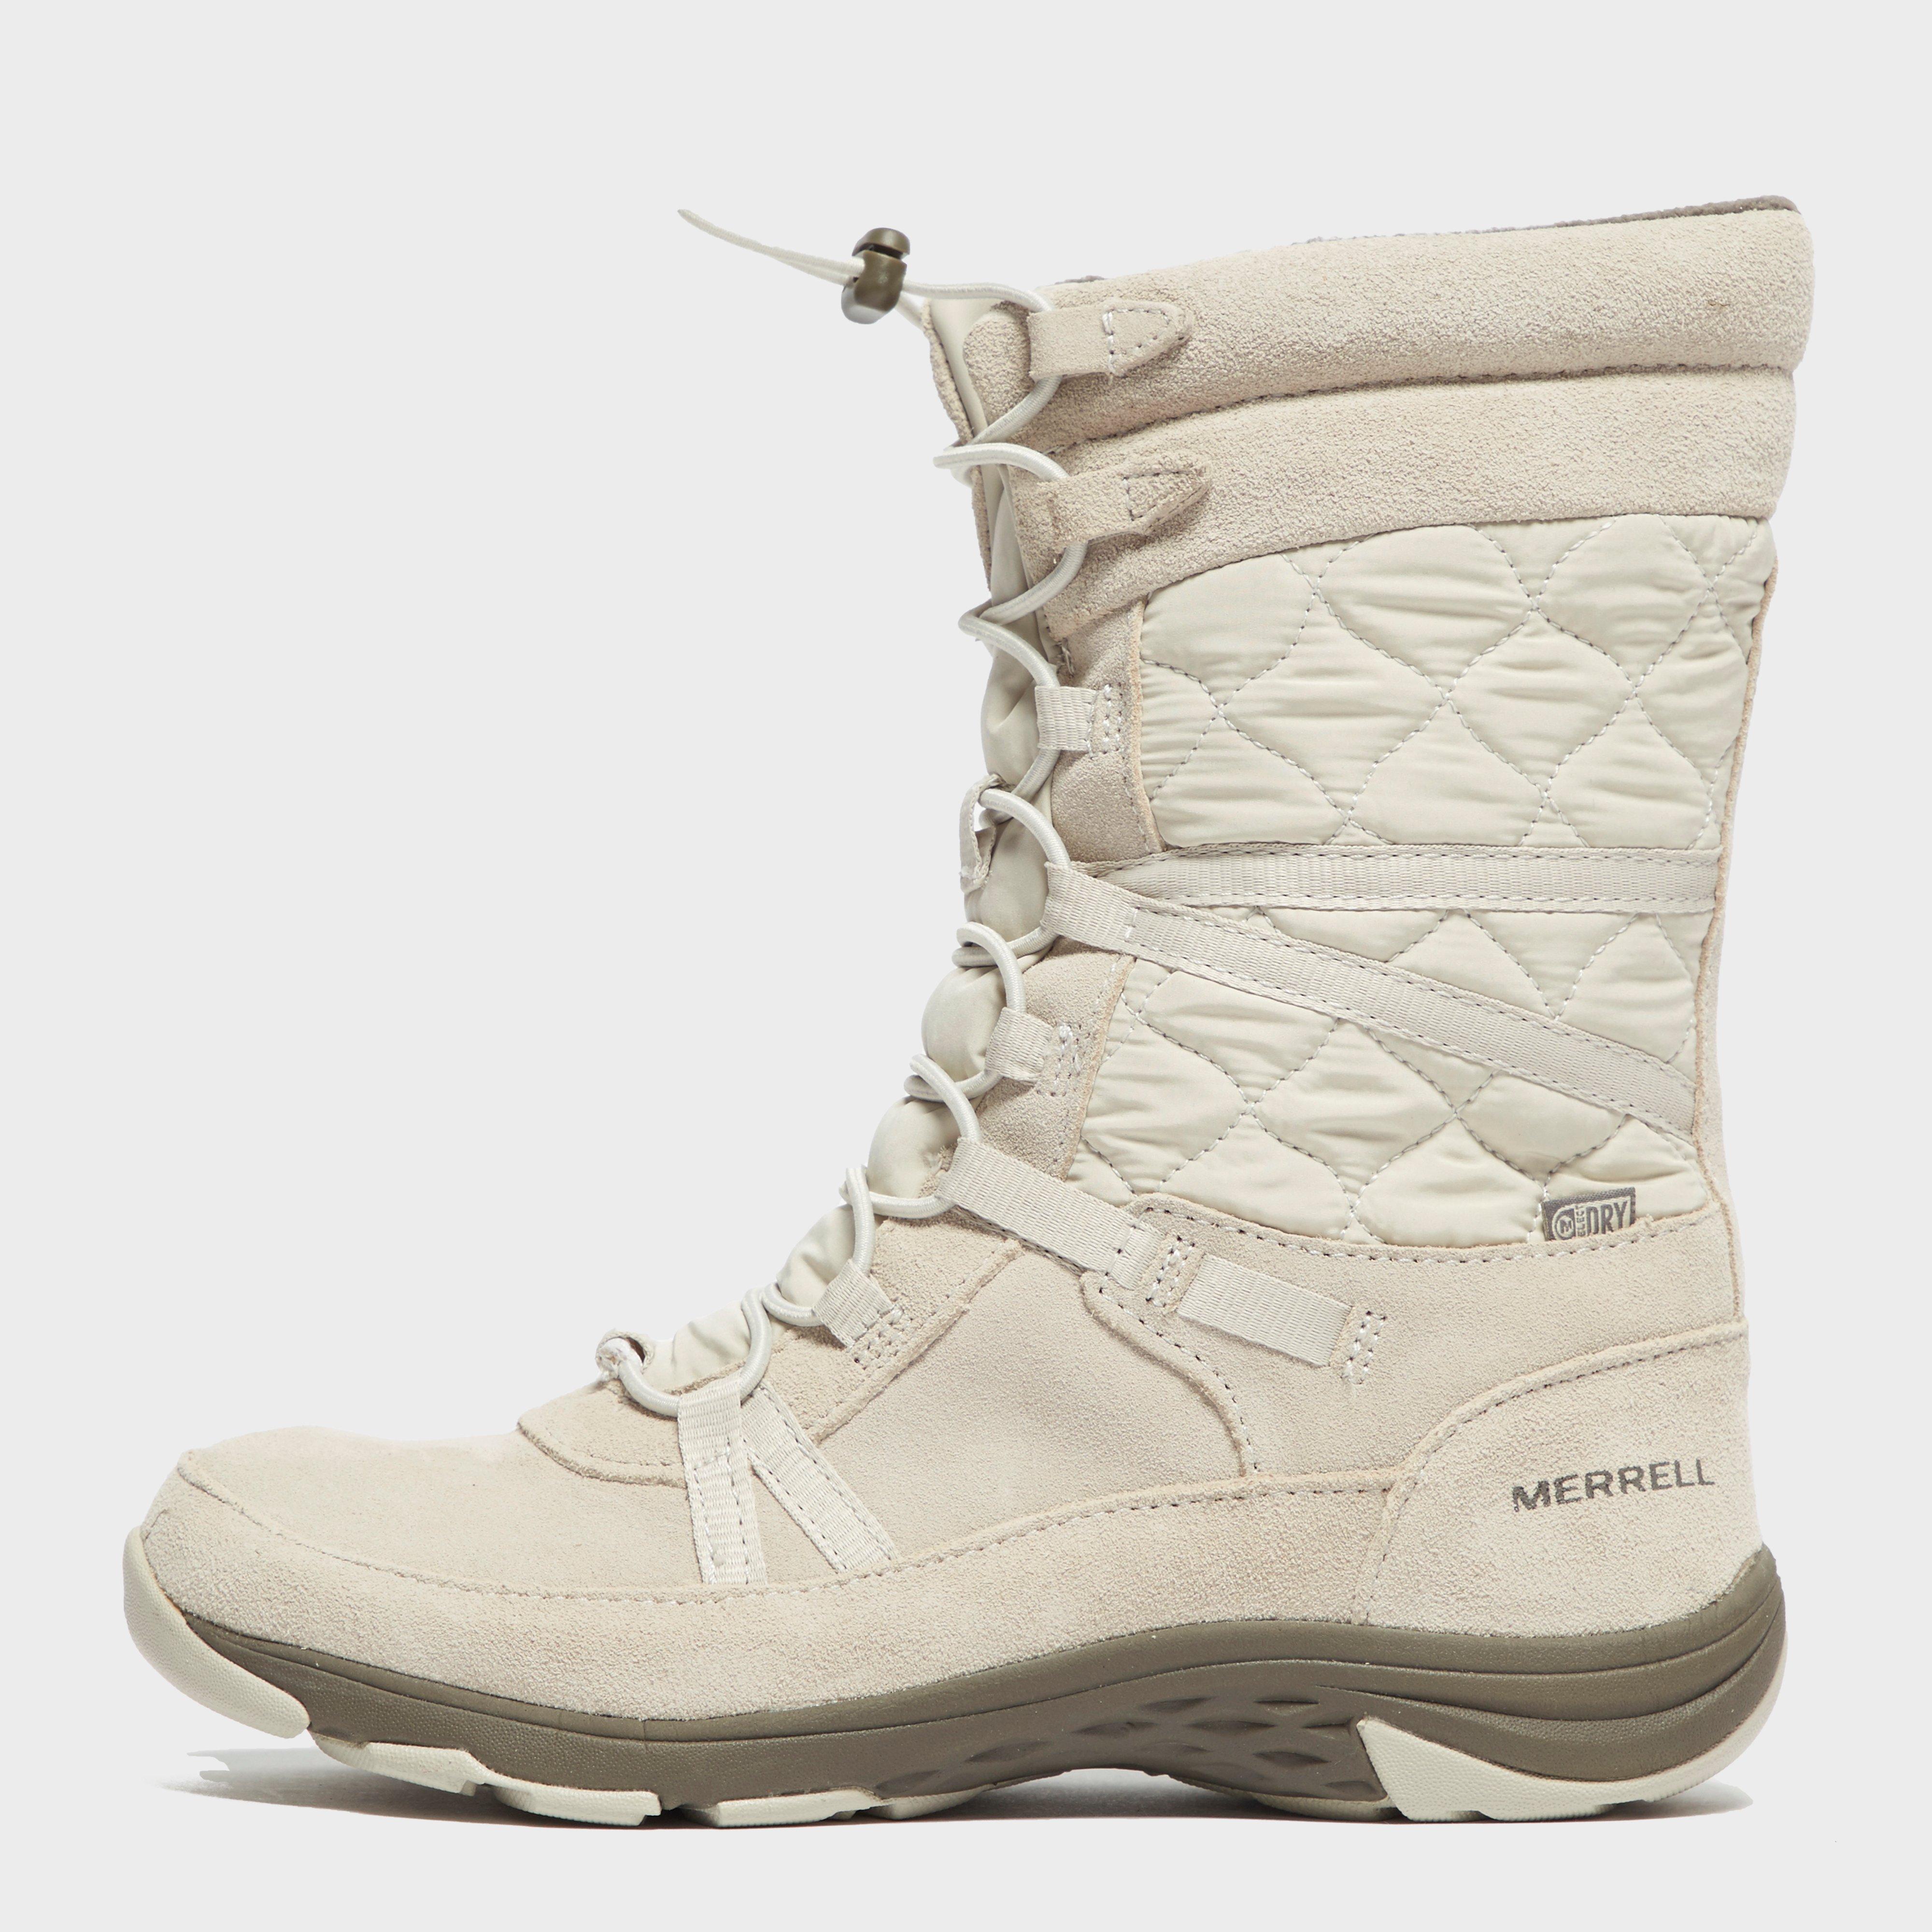 Merrell Womens Approach Tall Boots - Cream/lgy  Cream/lgy